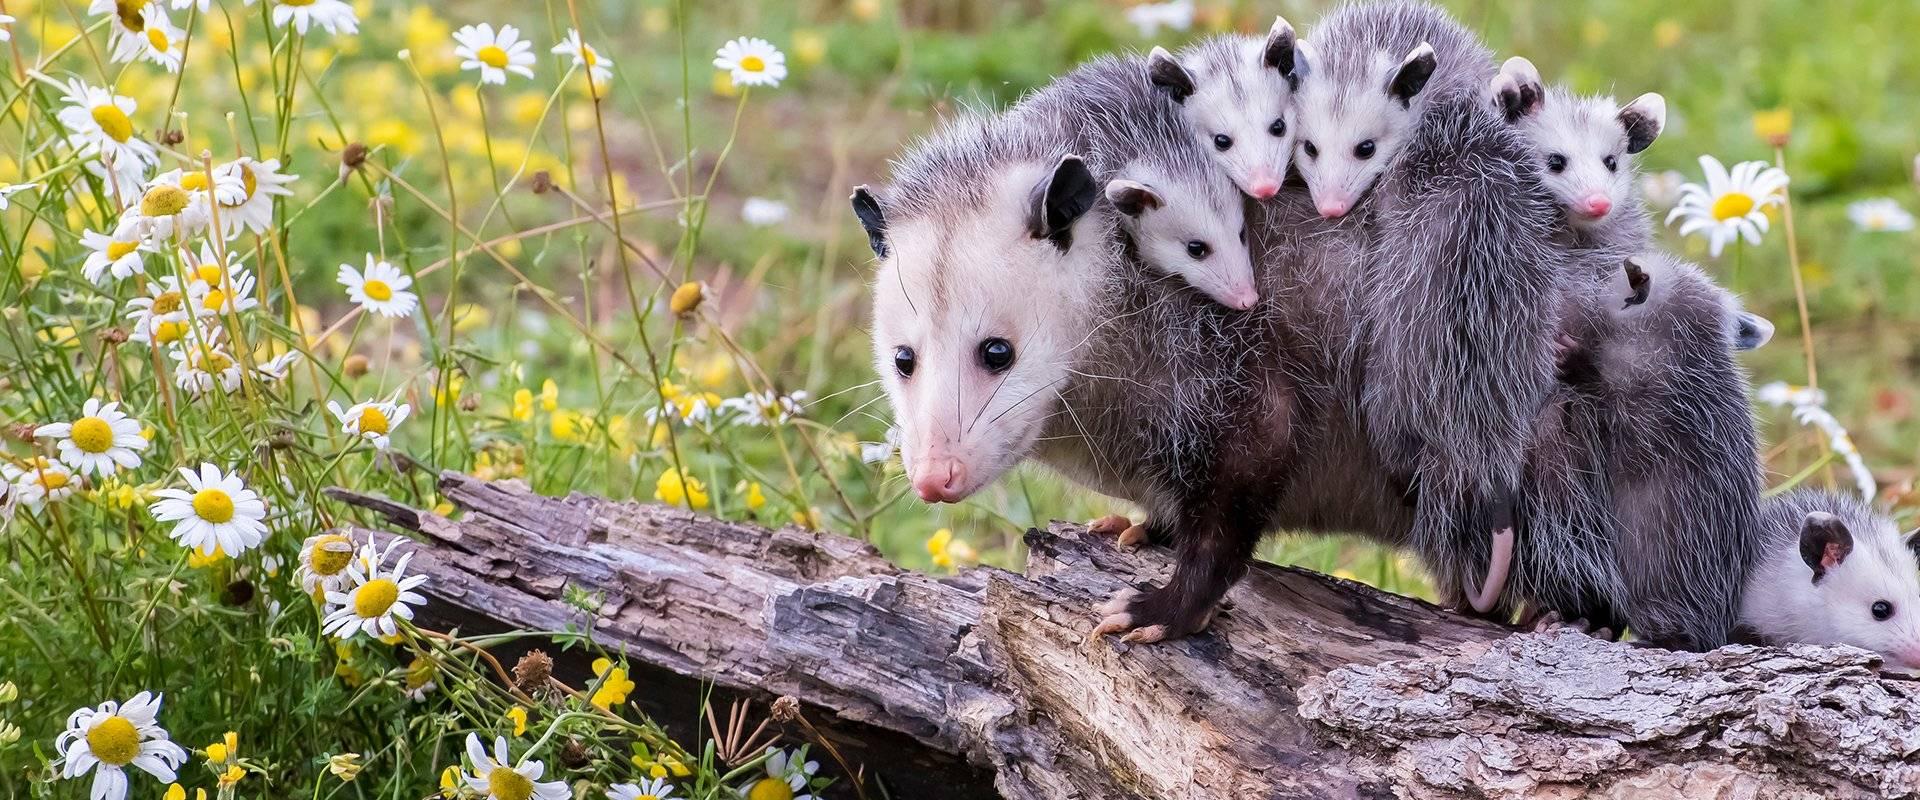 many opossums on a log